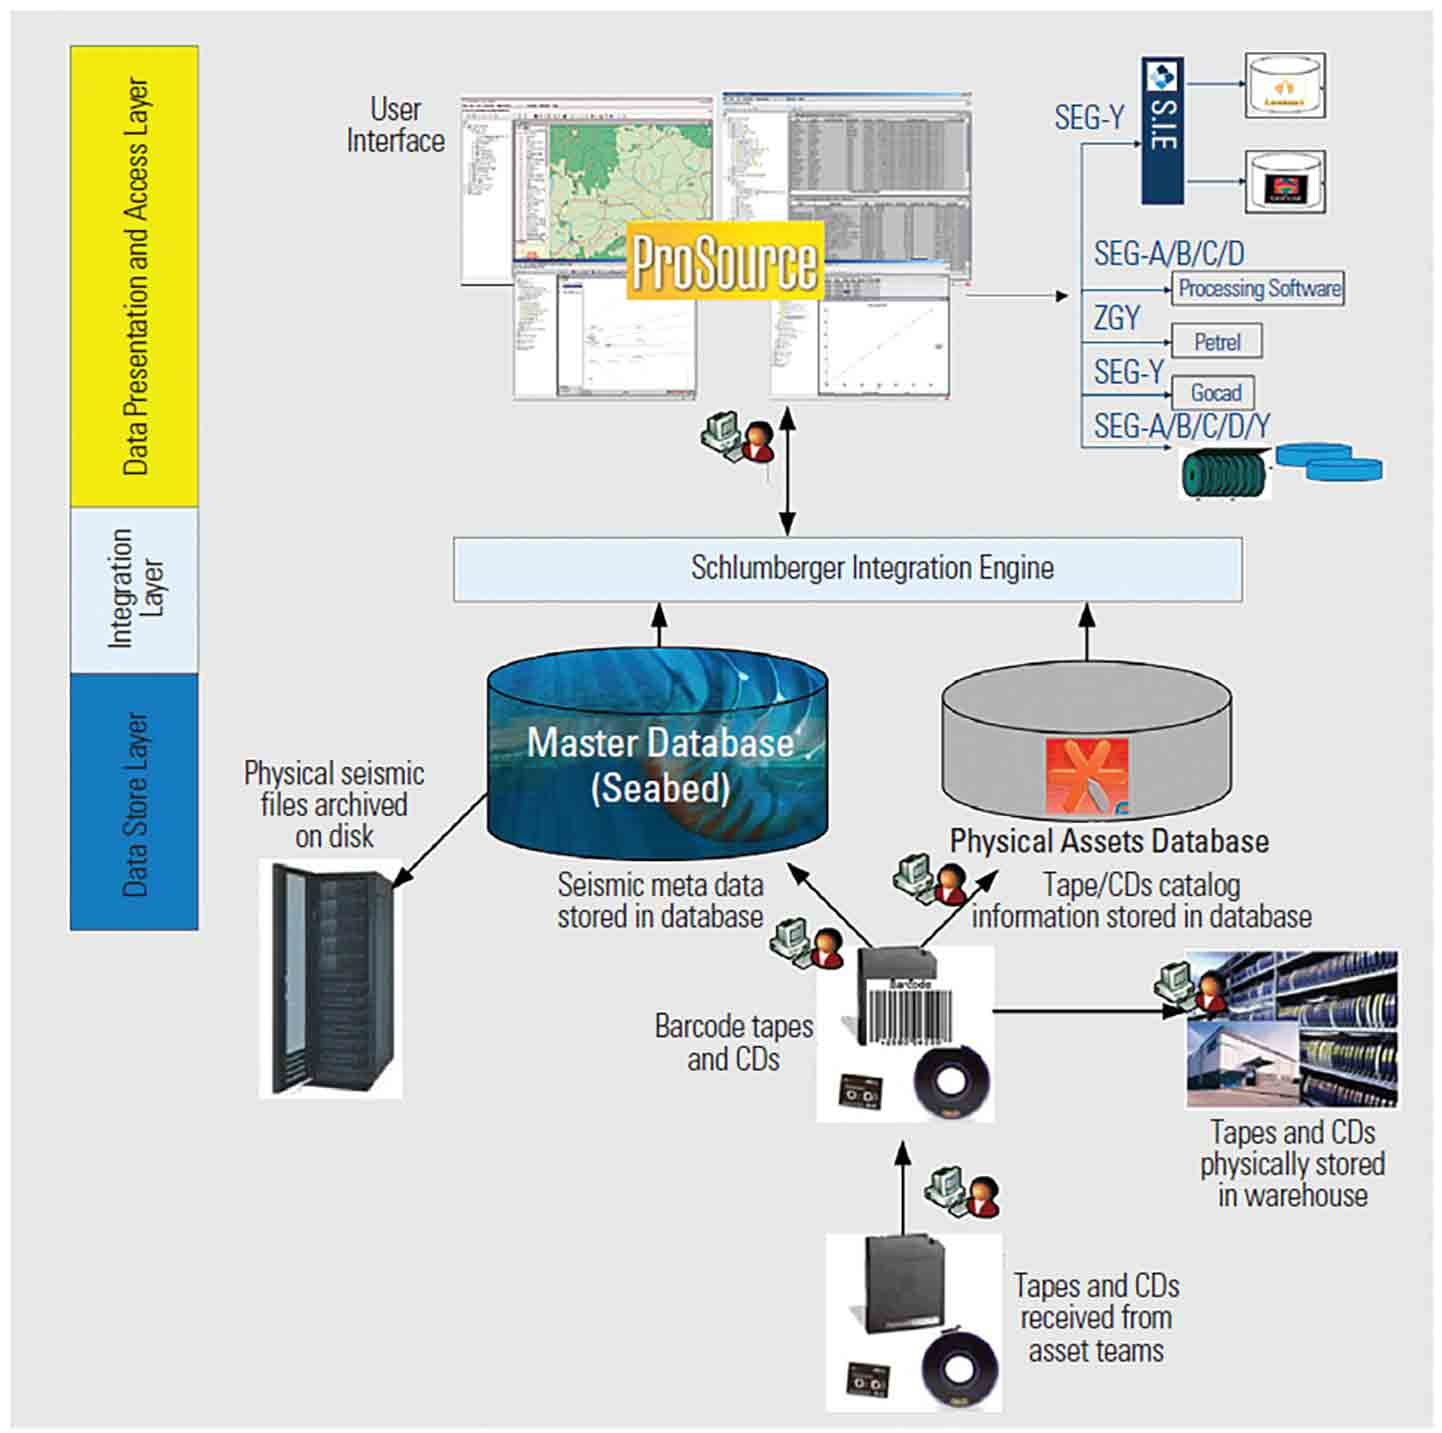 KOC Seismic Data Management System Drives Productivity | Schlumberger